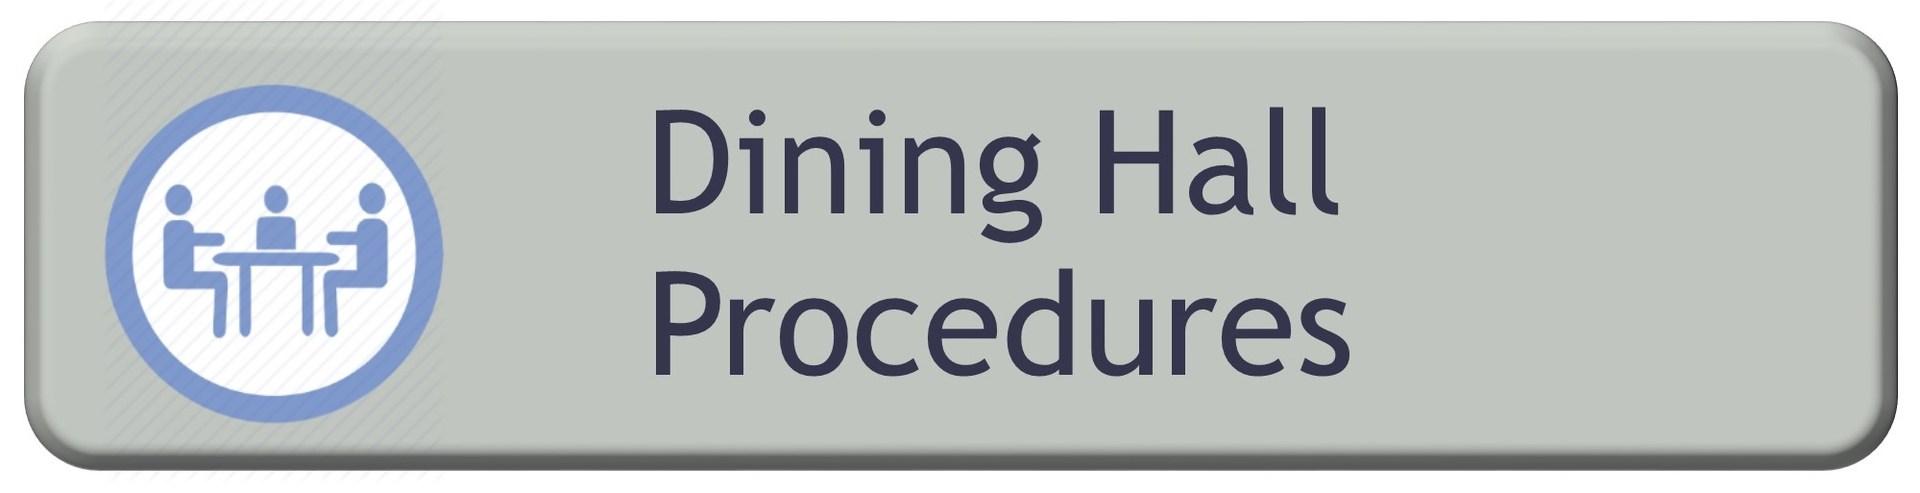 Dining Hall Procedures